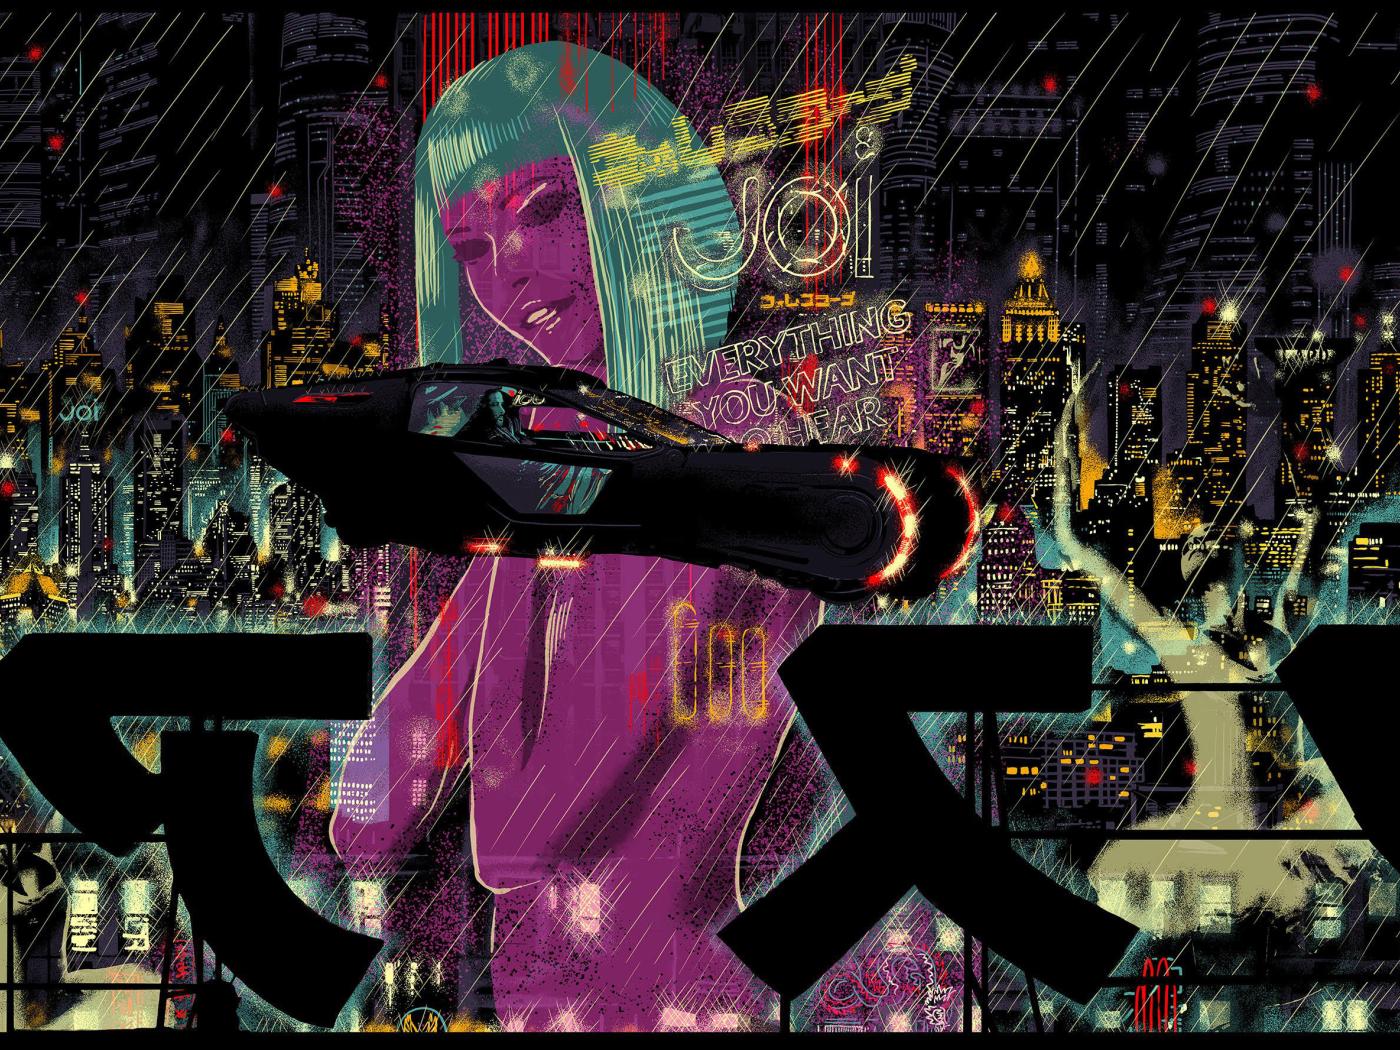 Blade Runner, HD 4K Wallpaper Wallpaper Hd For Mobile Samsung Galaxy S4